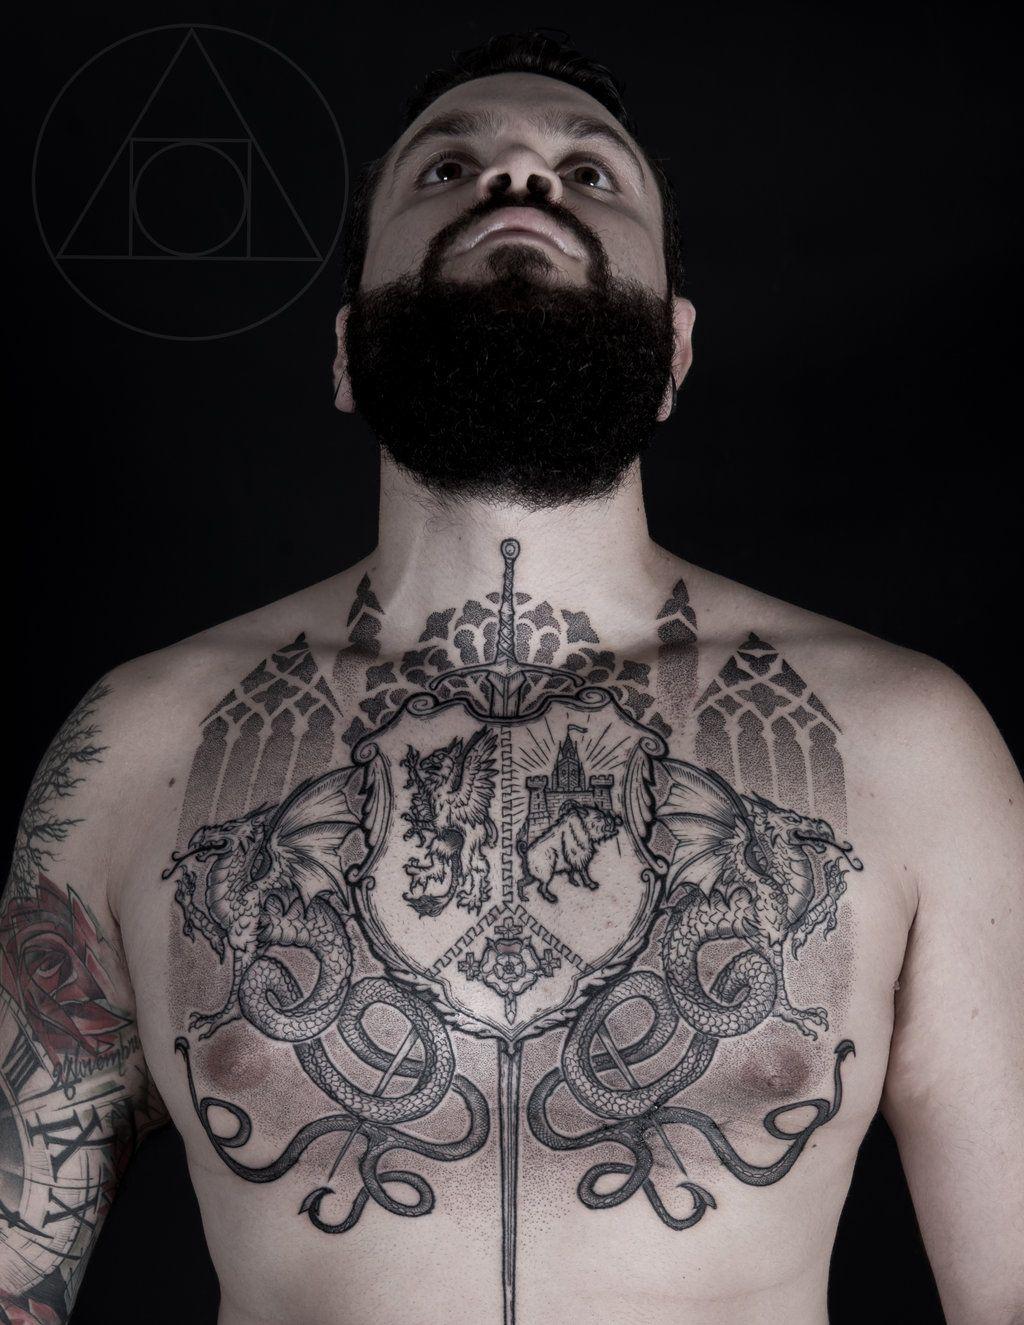 tattoo parlors in chico california